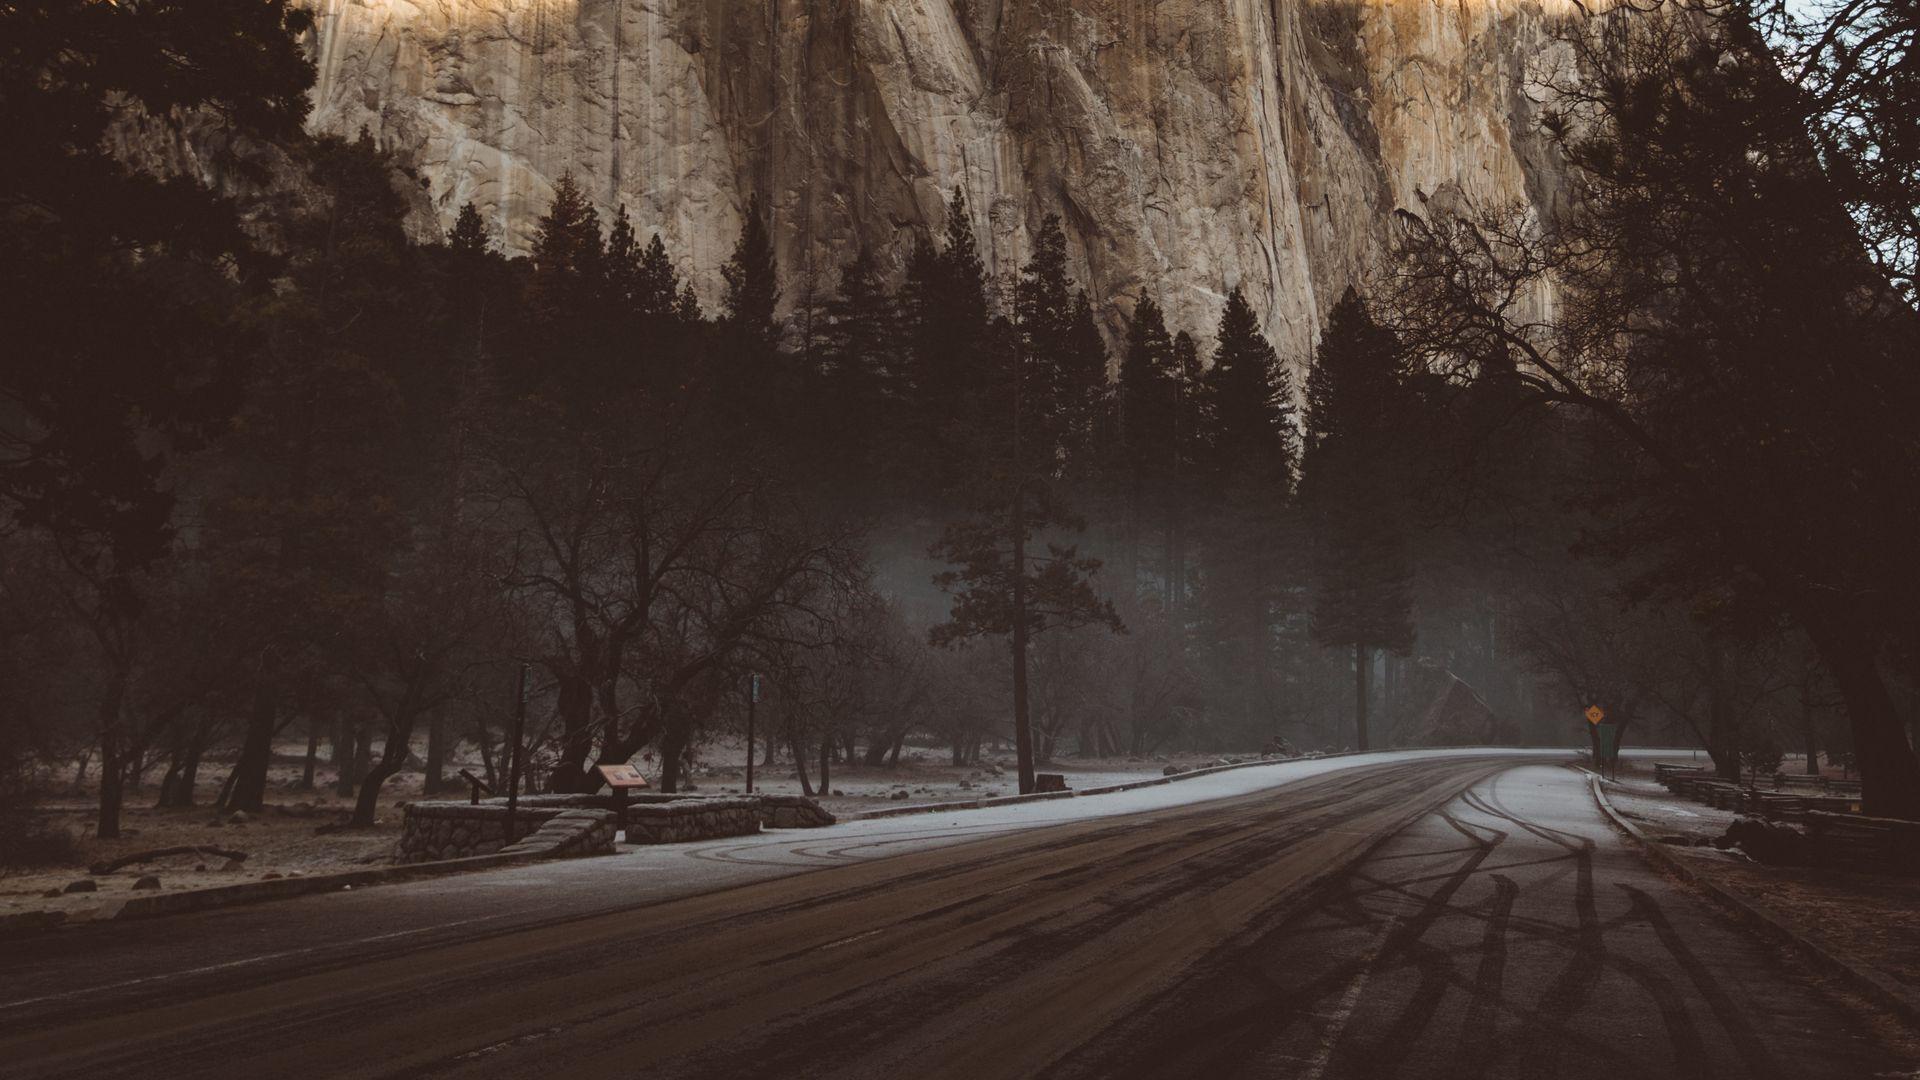 Pin On Wallpaper Hd wallpaper road turn trees mountain